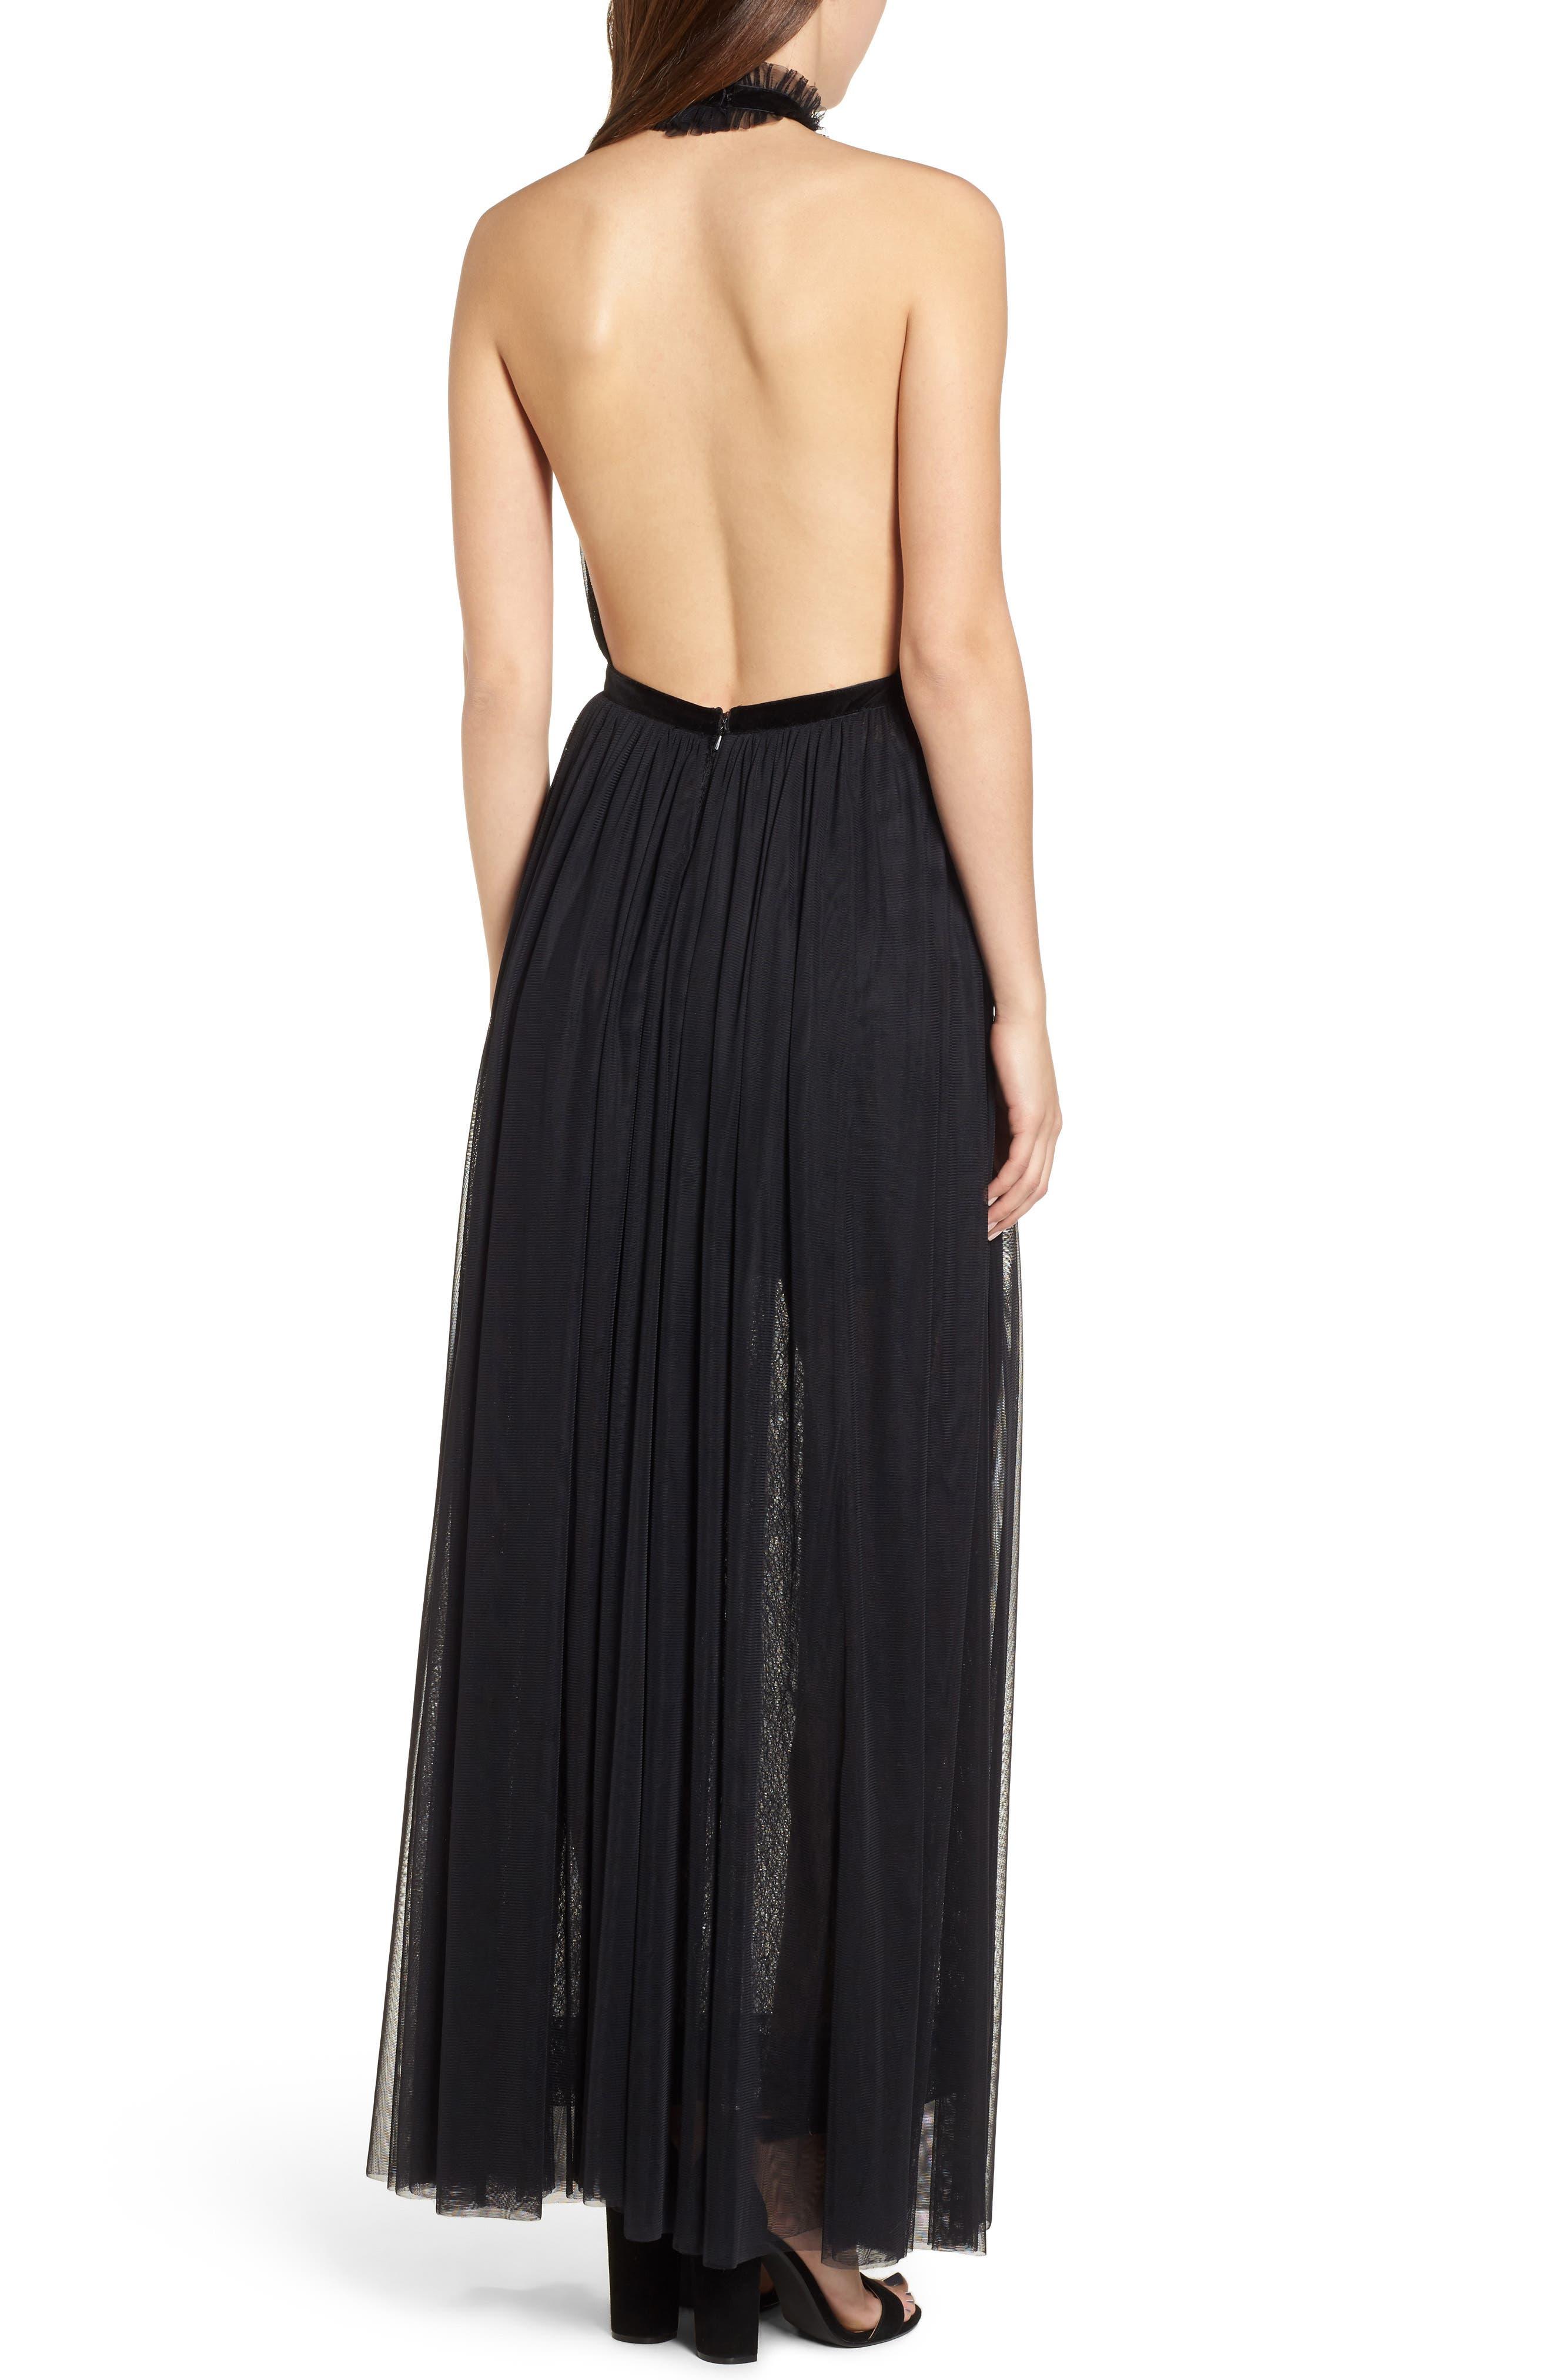 Taylor Halter Maxi Dress,                             Alternate thumbnail 2, color,                             001